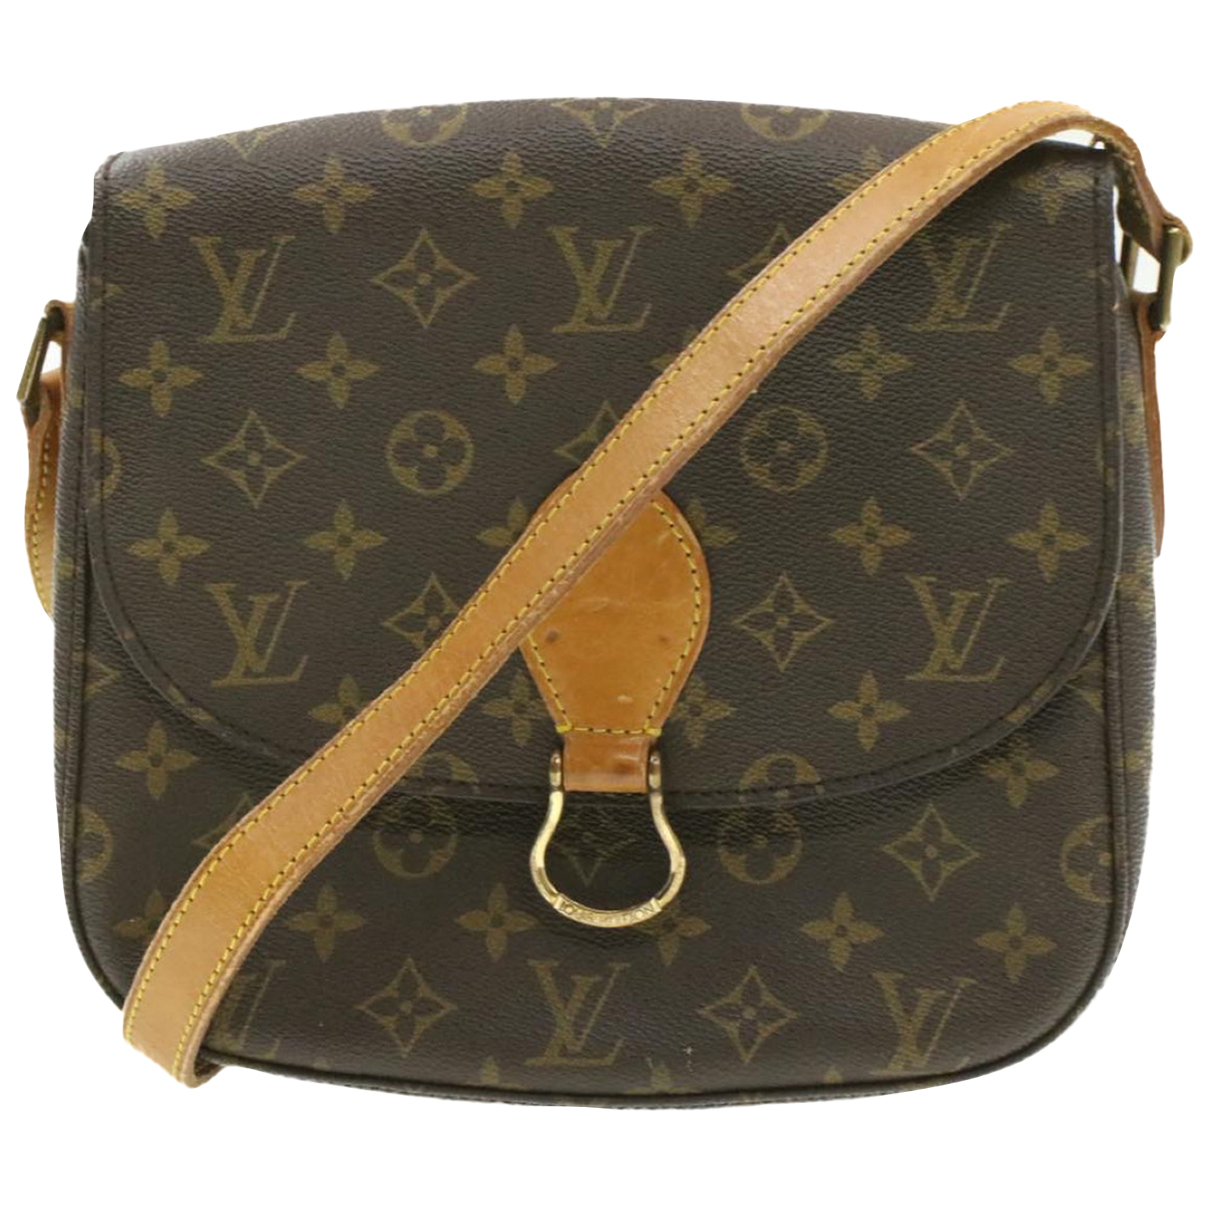 Louis Vuitton Petit Noe trunk Handtasche in  Braun Leinen